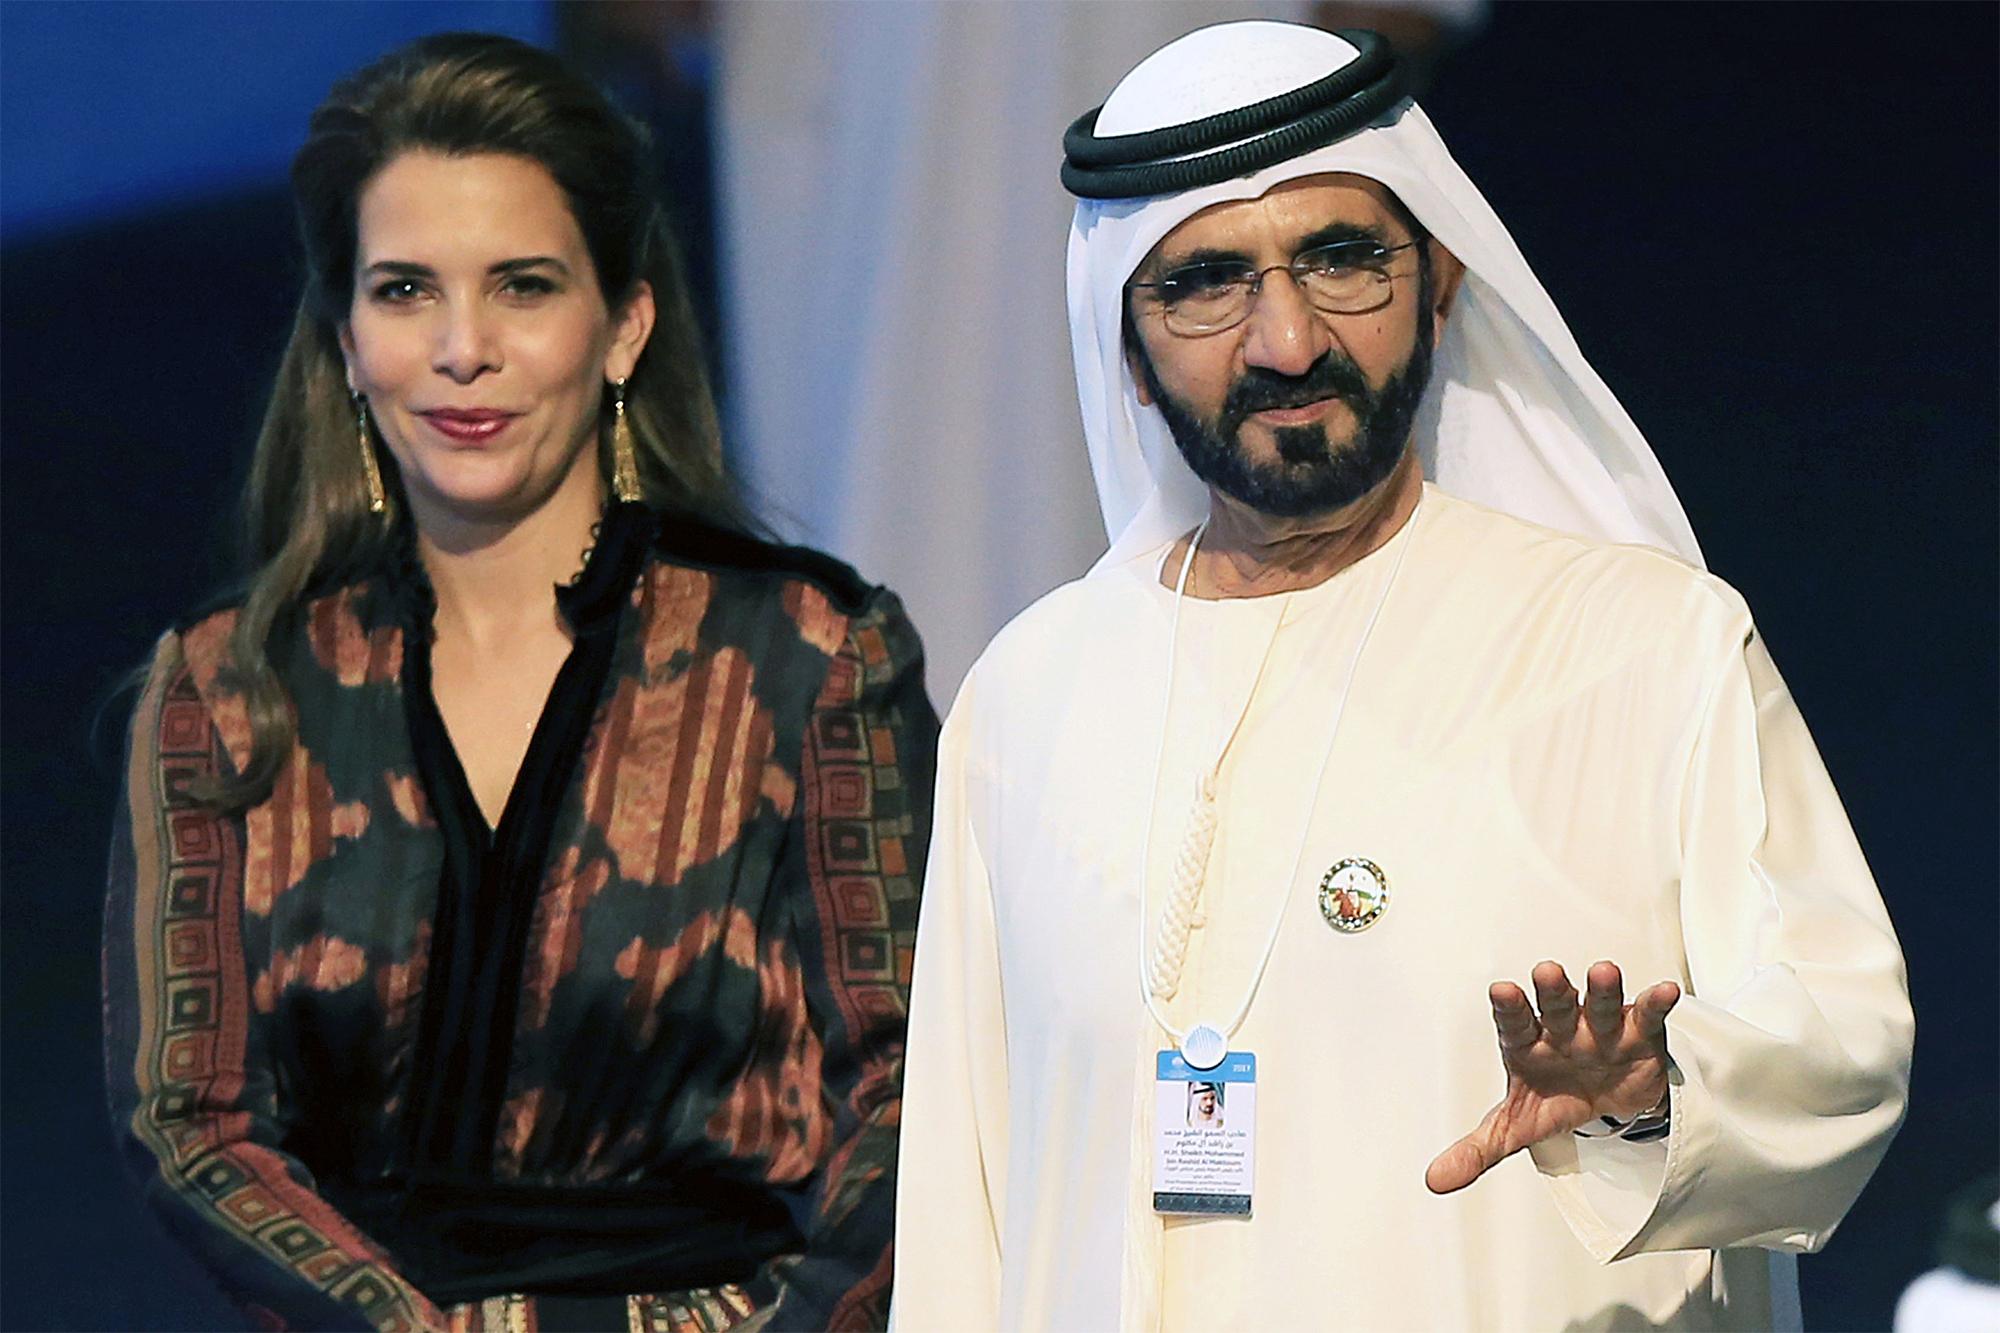 Dubai's Princess Haya paid .4M to keep affair secret: report